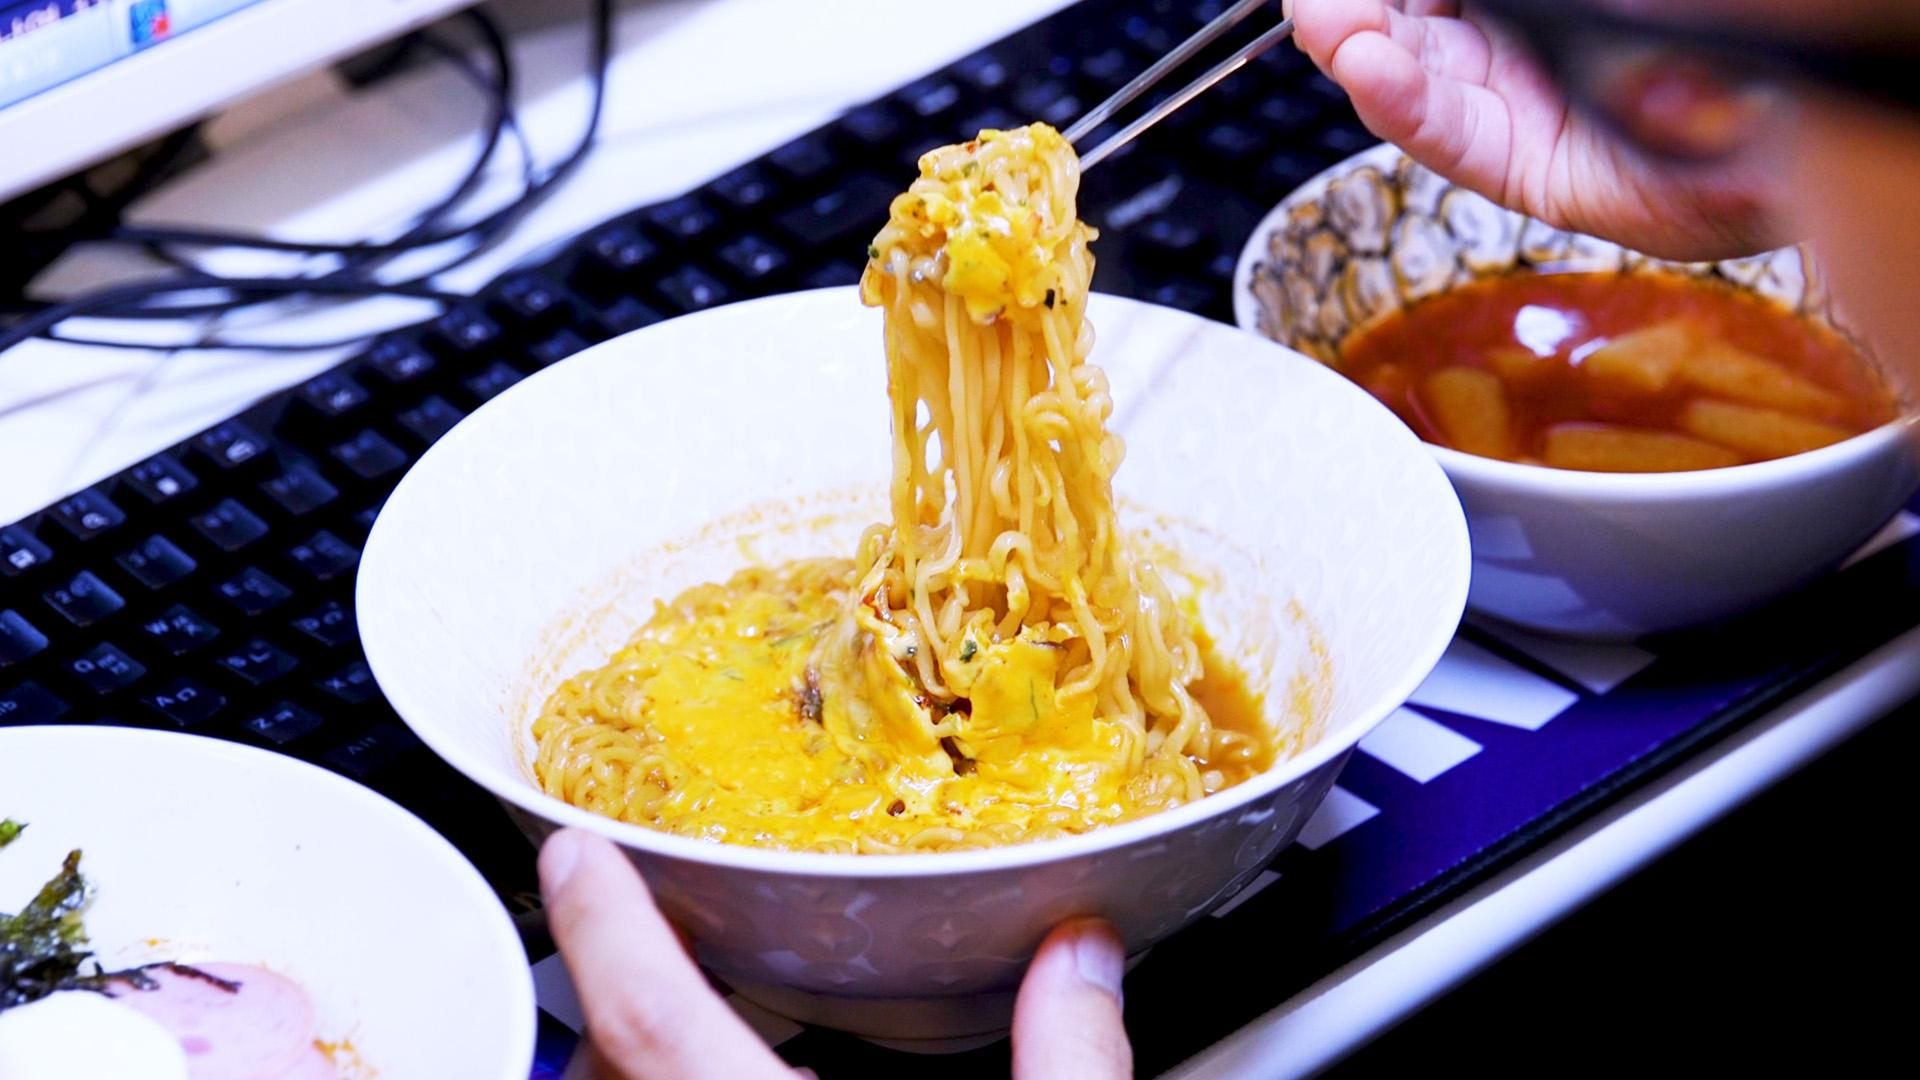 Watch: The Korean Gaming Cafes Serving Cheese Ramen, Corn